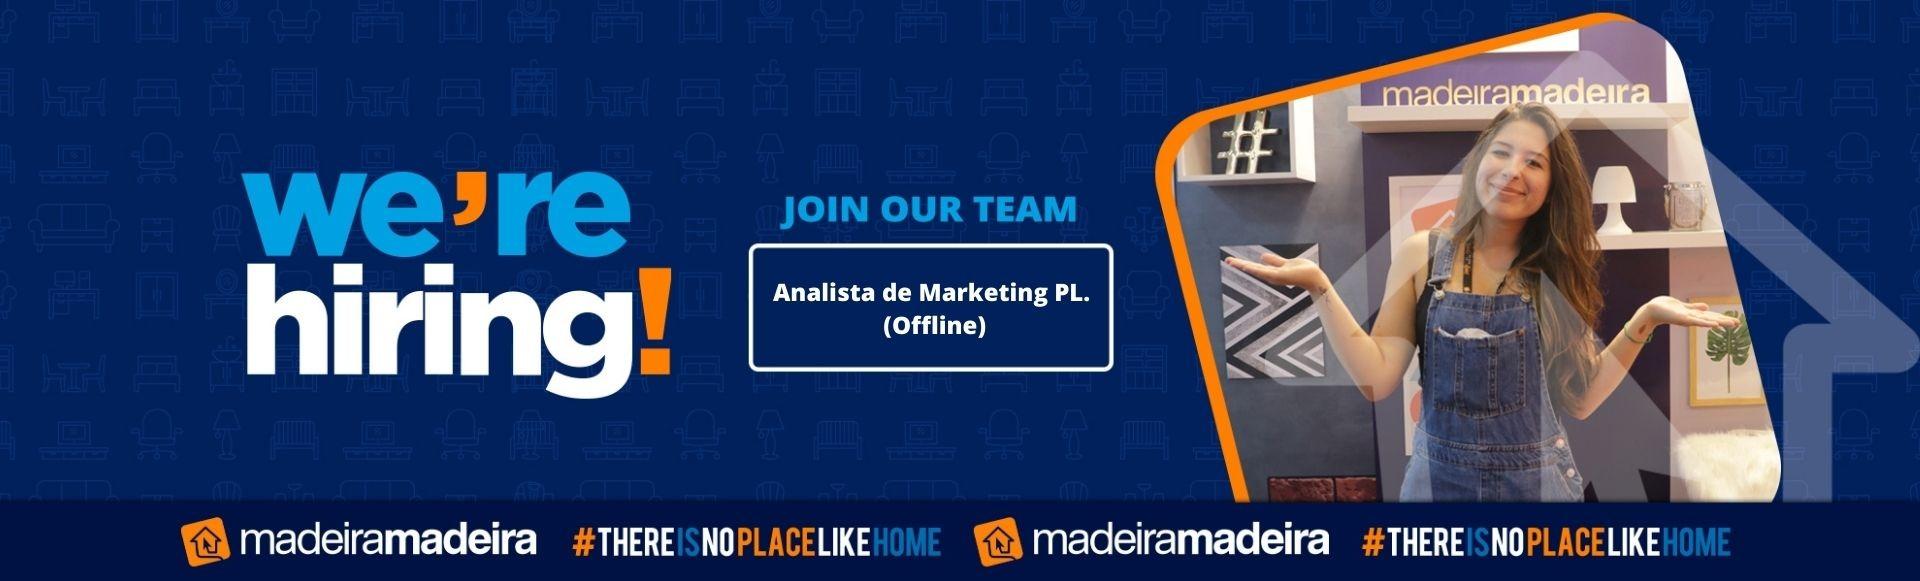 Analista de Marketing PL (Offline)